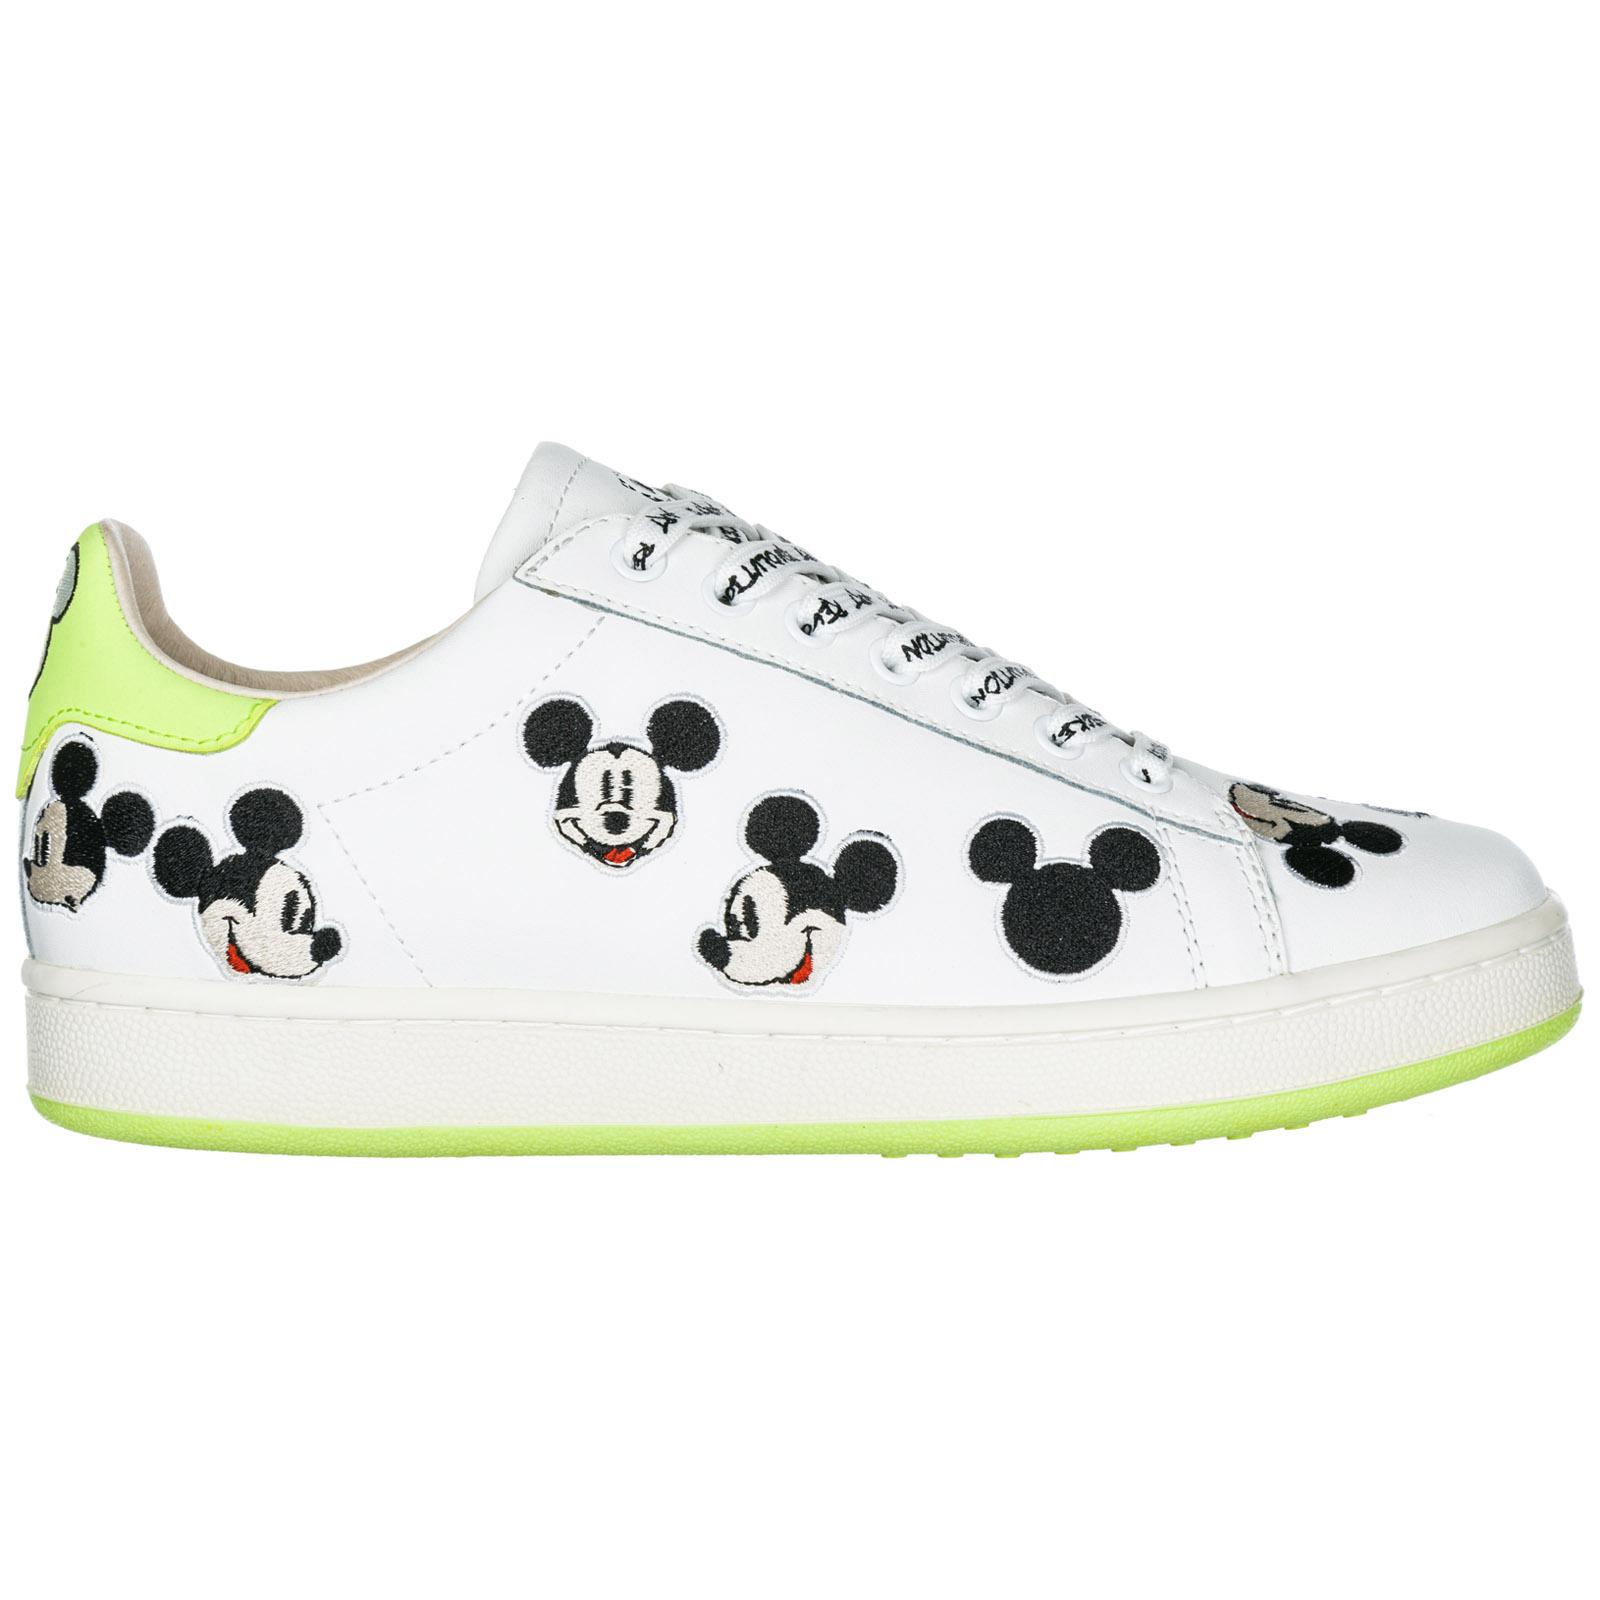 Mickey Turnschuhe Mouse Damenschuhe Leder Sneakers Disney Damen Schuhe PuTZiwXOk